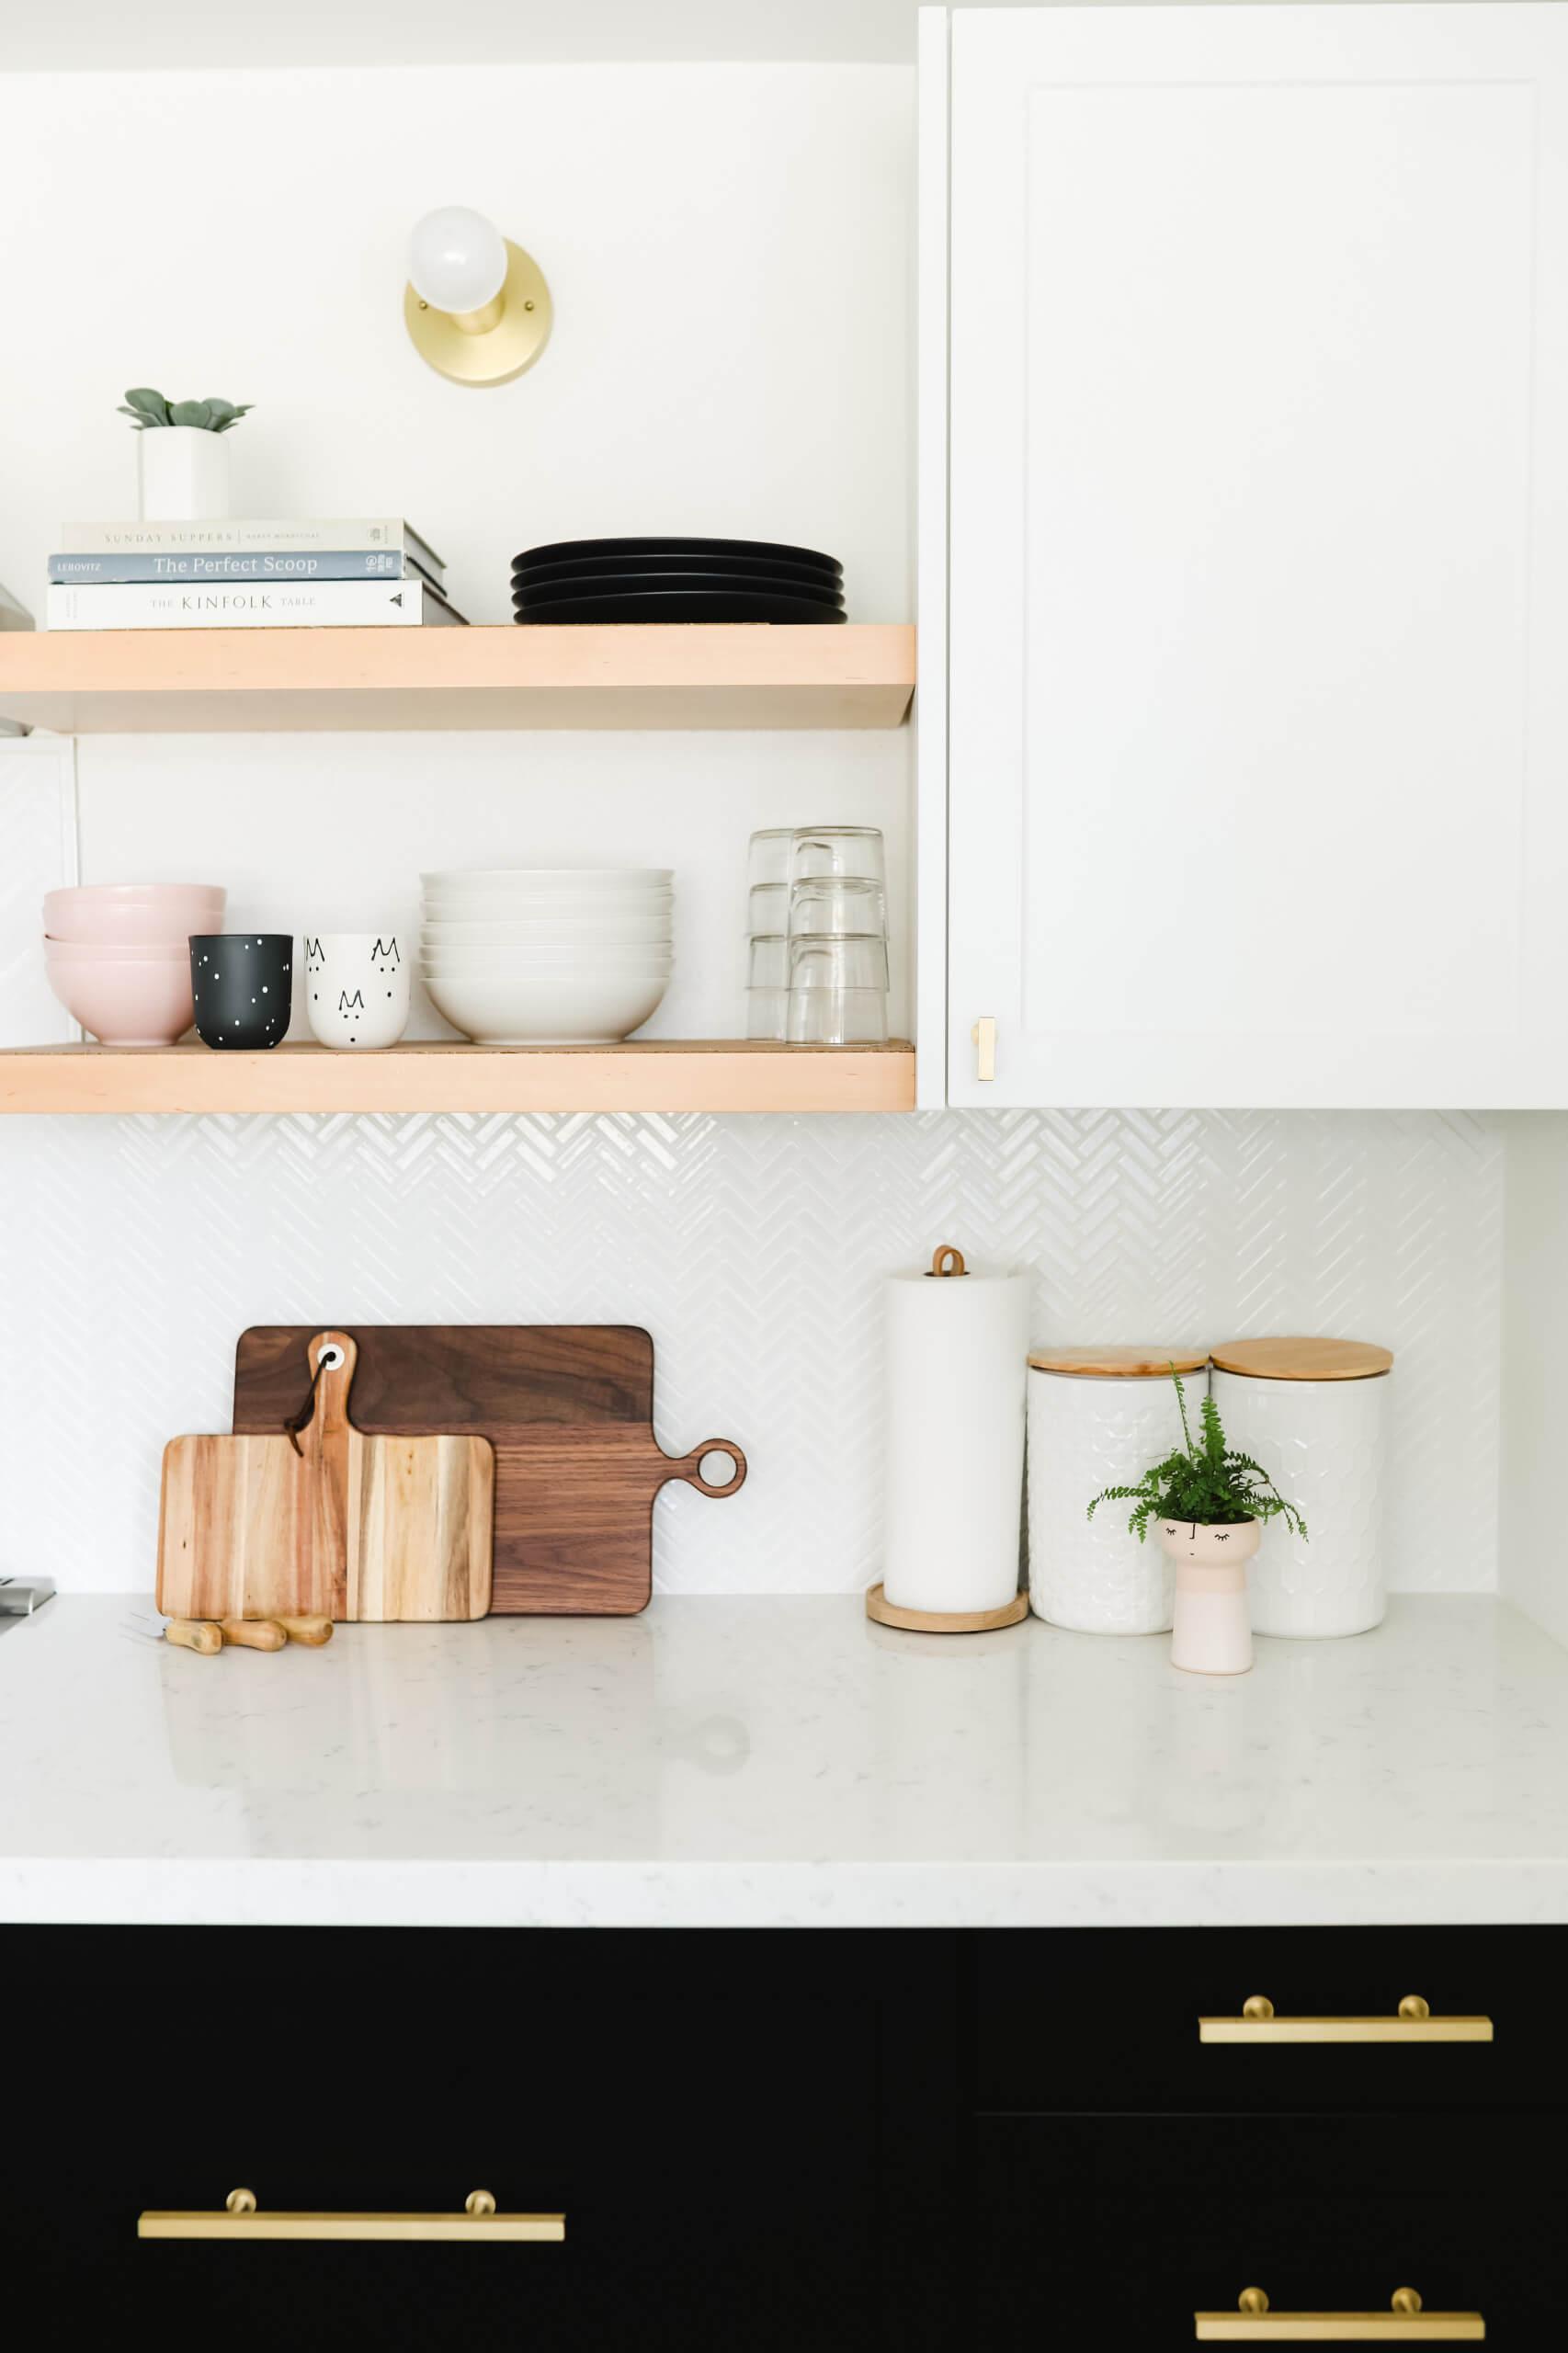 3. Multifunctional shelves